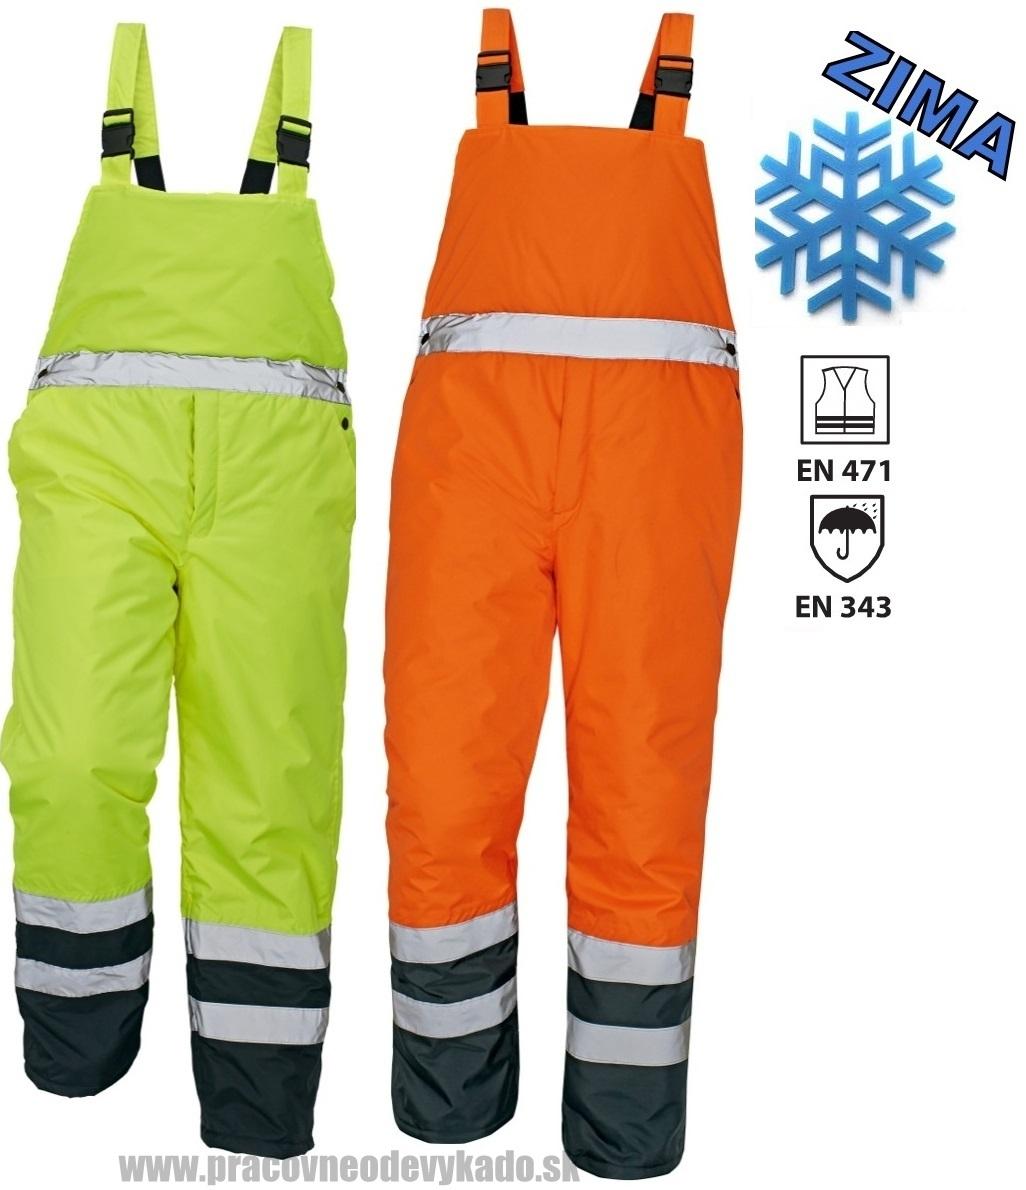 Pracovné odevy - Reflexné zateplené nohavice PADSTOW HV ČERVA 2db55684f4d